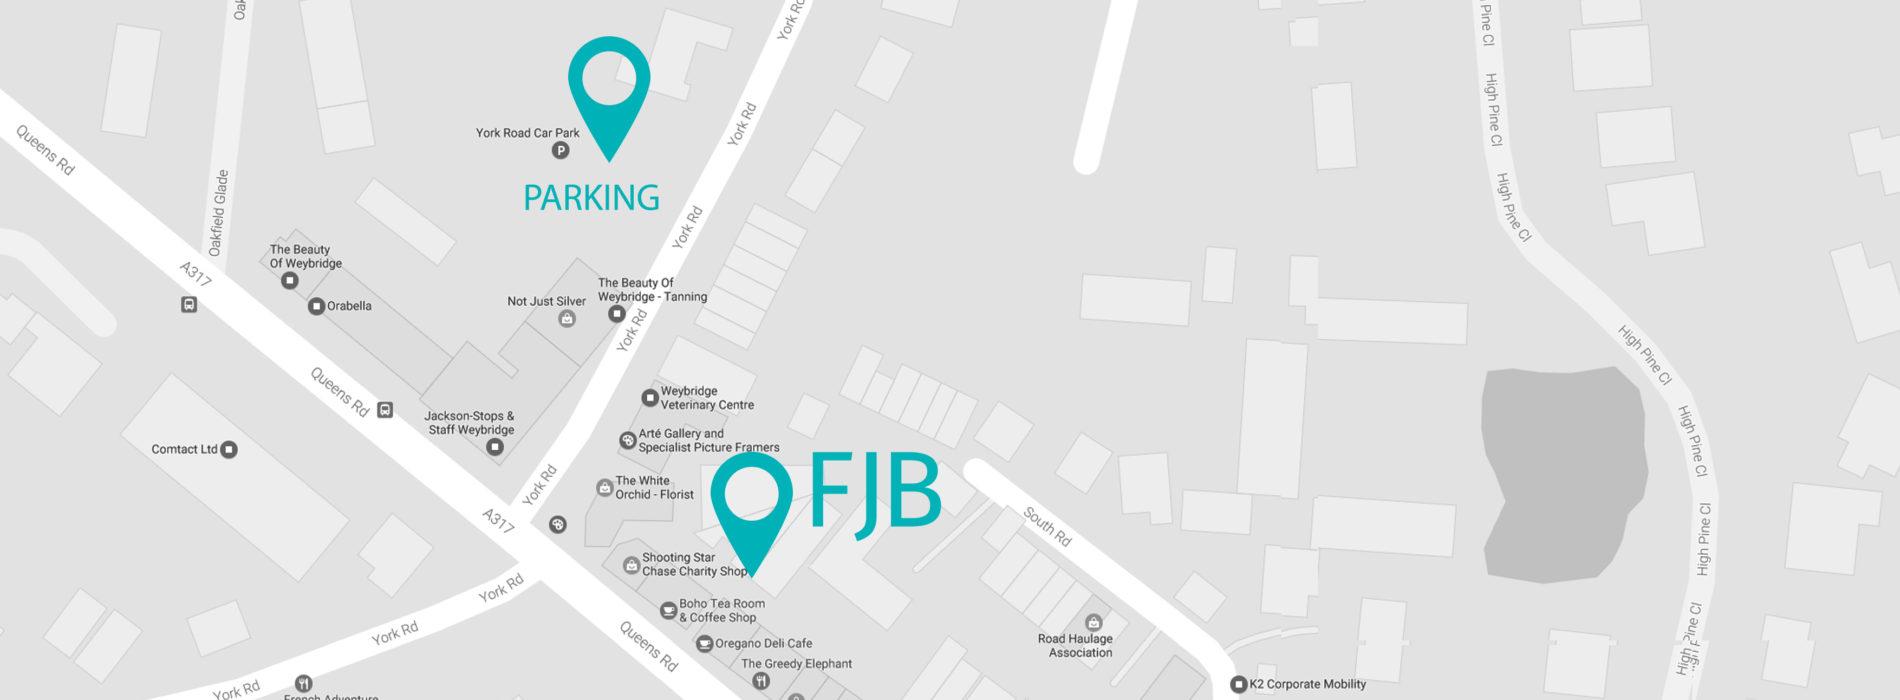 FJB MAP mobile